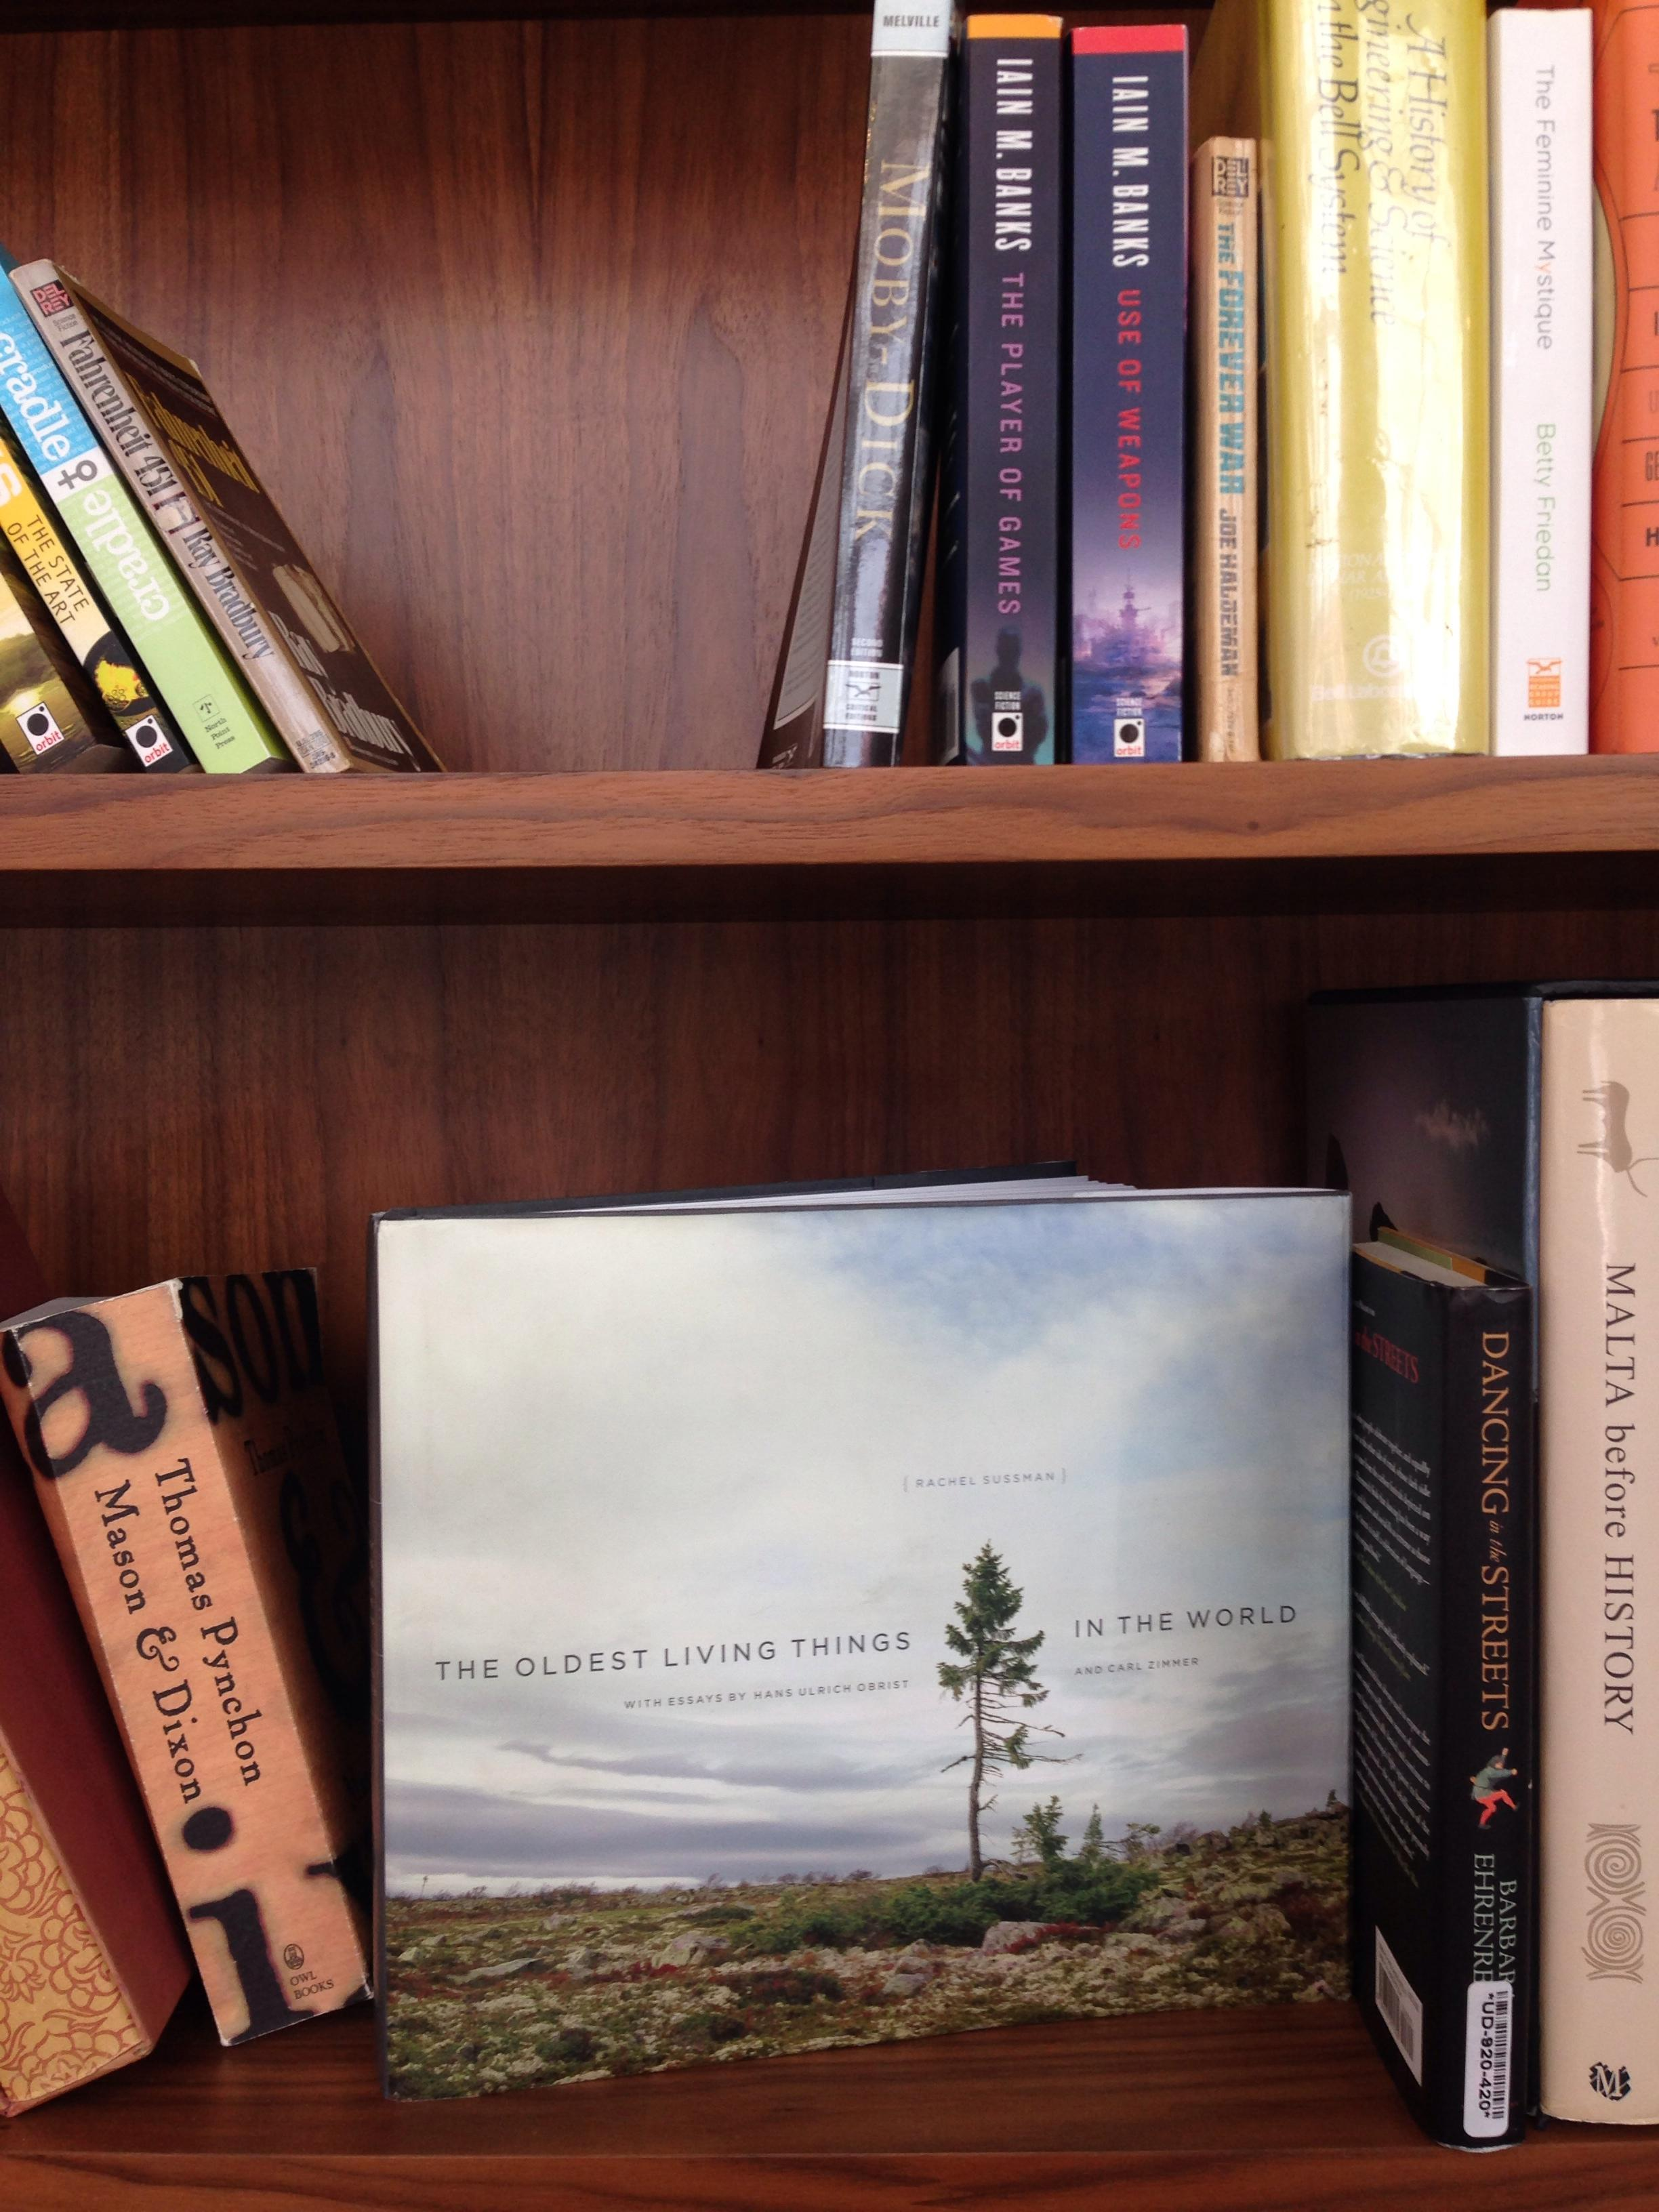 migliore libreria - 28 images - stunning libreria scala trento ideas ...